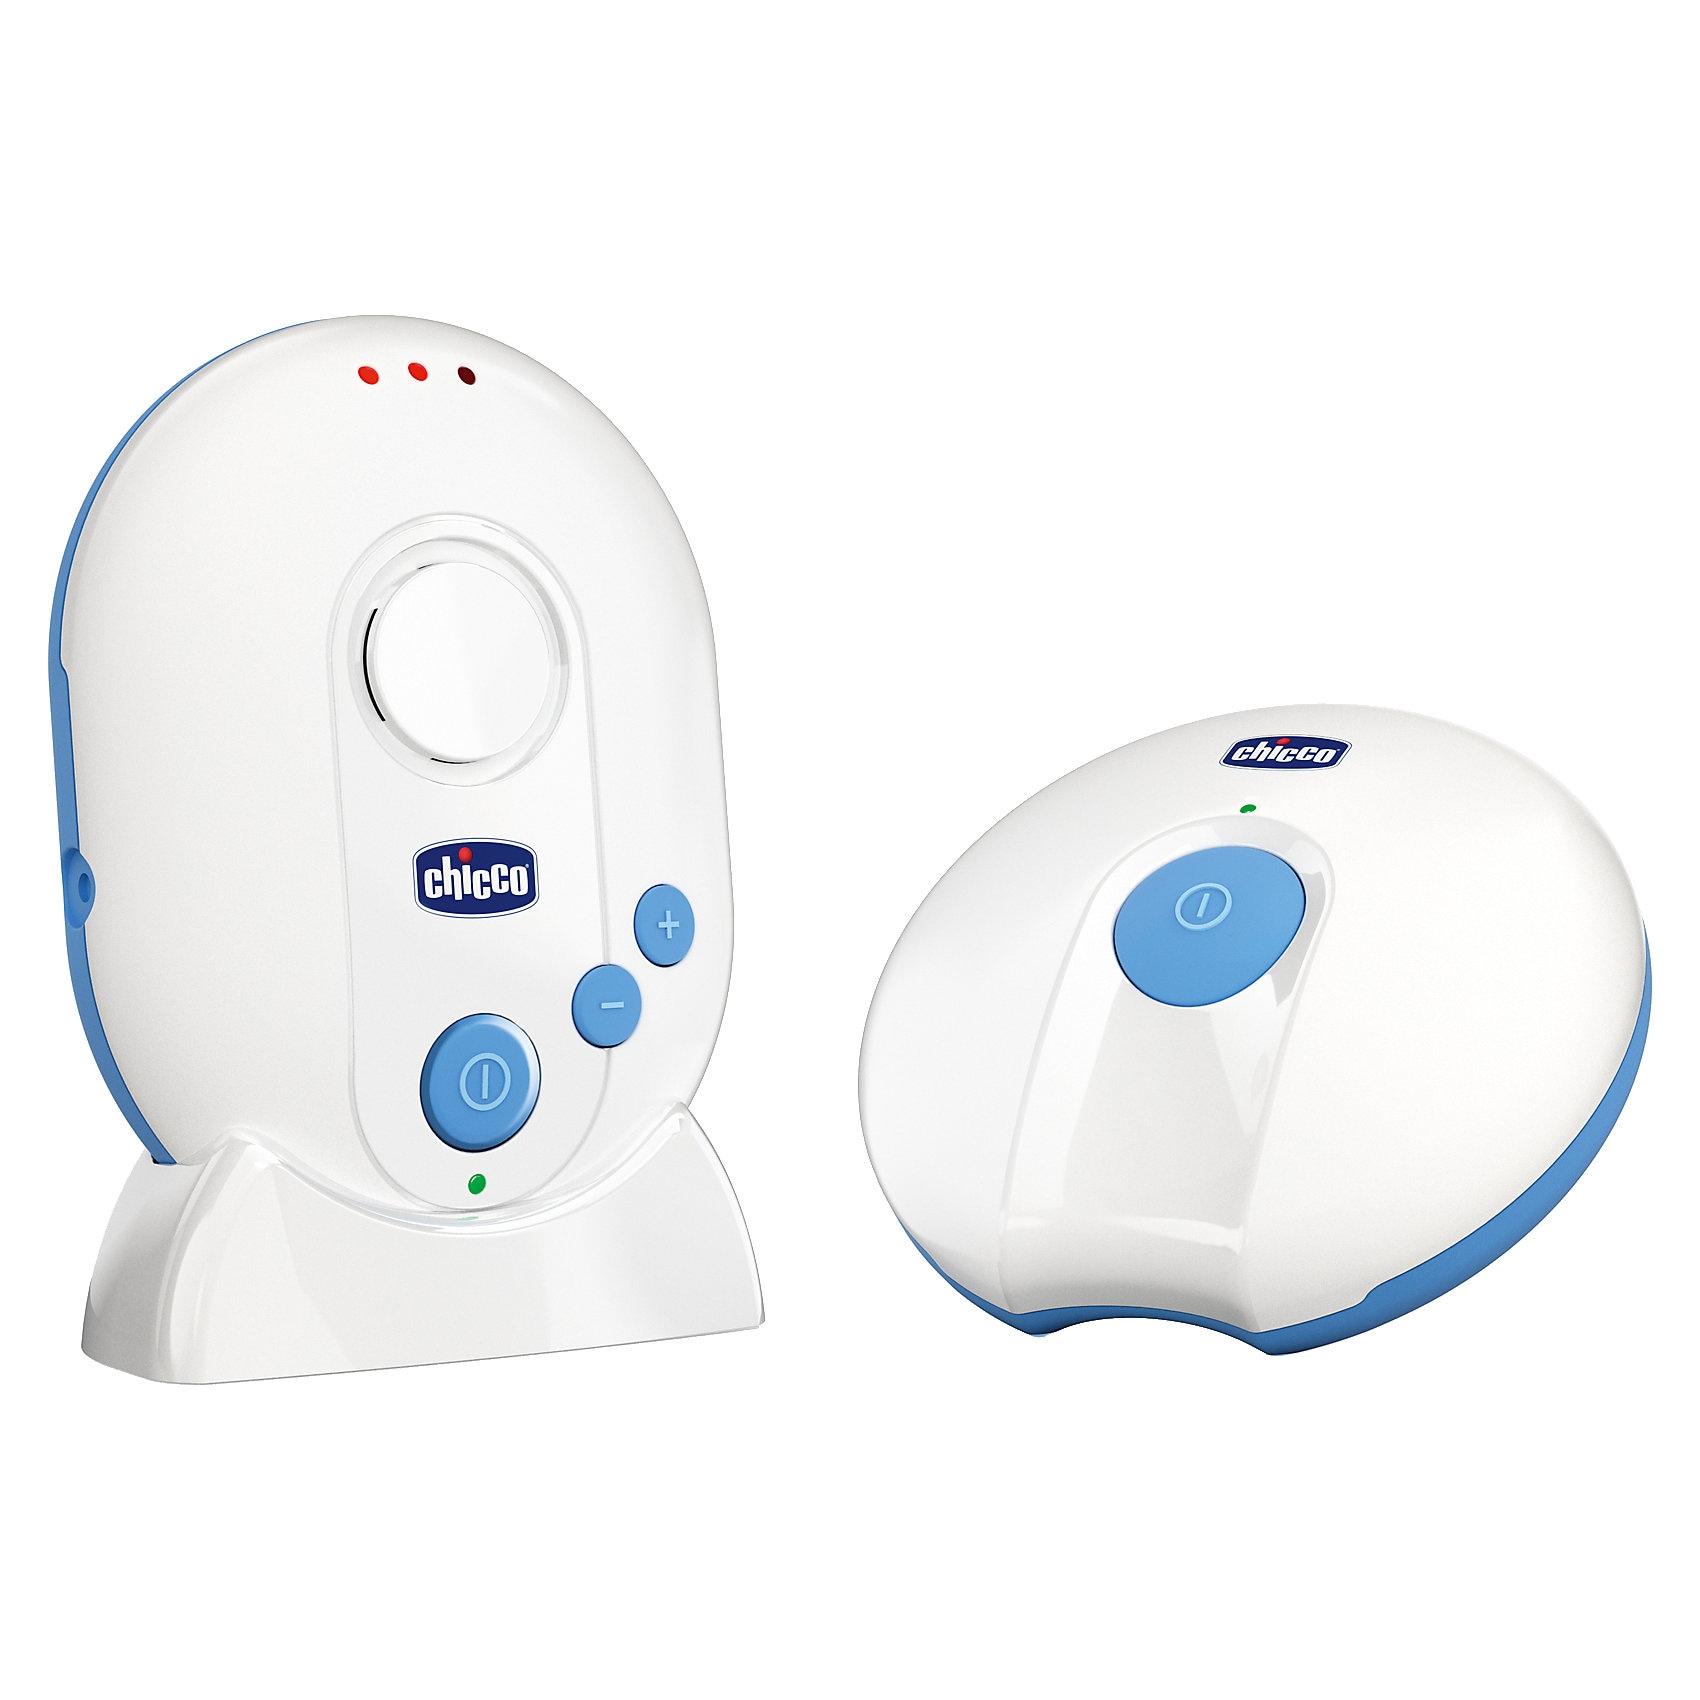 Chicco Babyphone Digital Audio Always with you